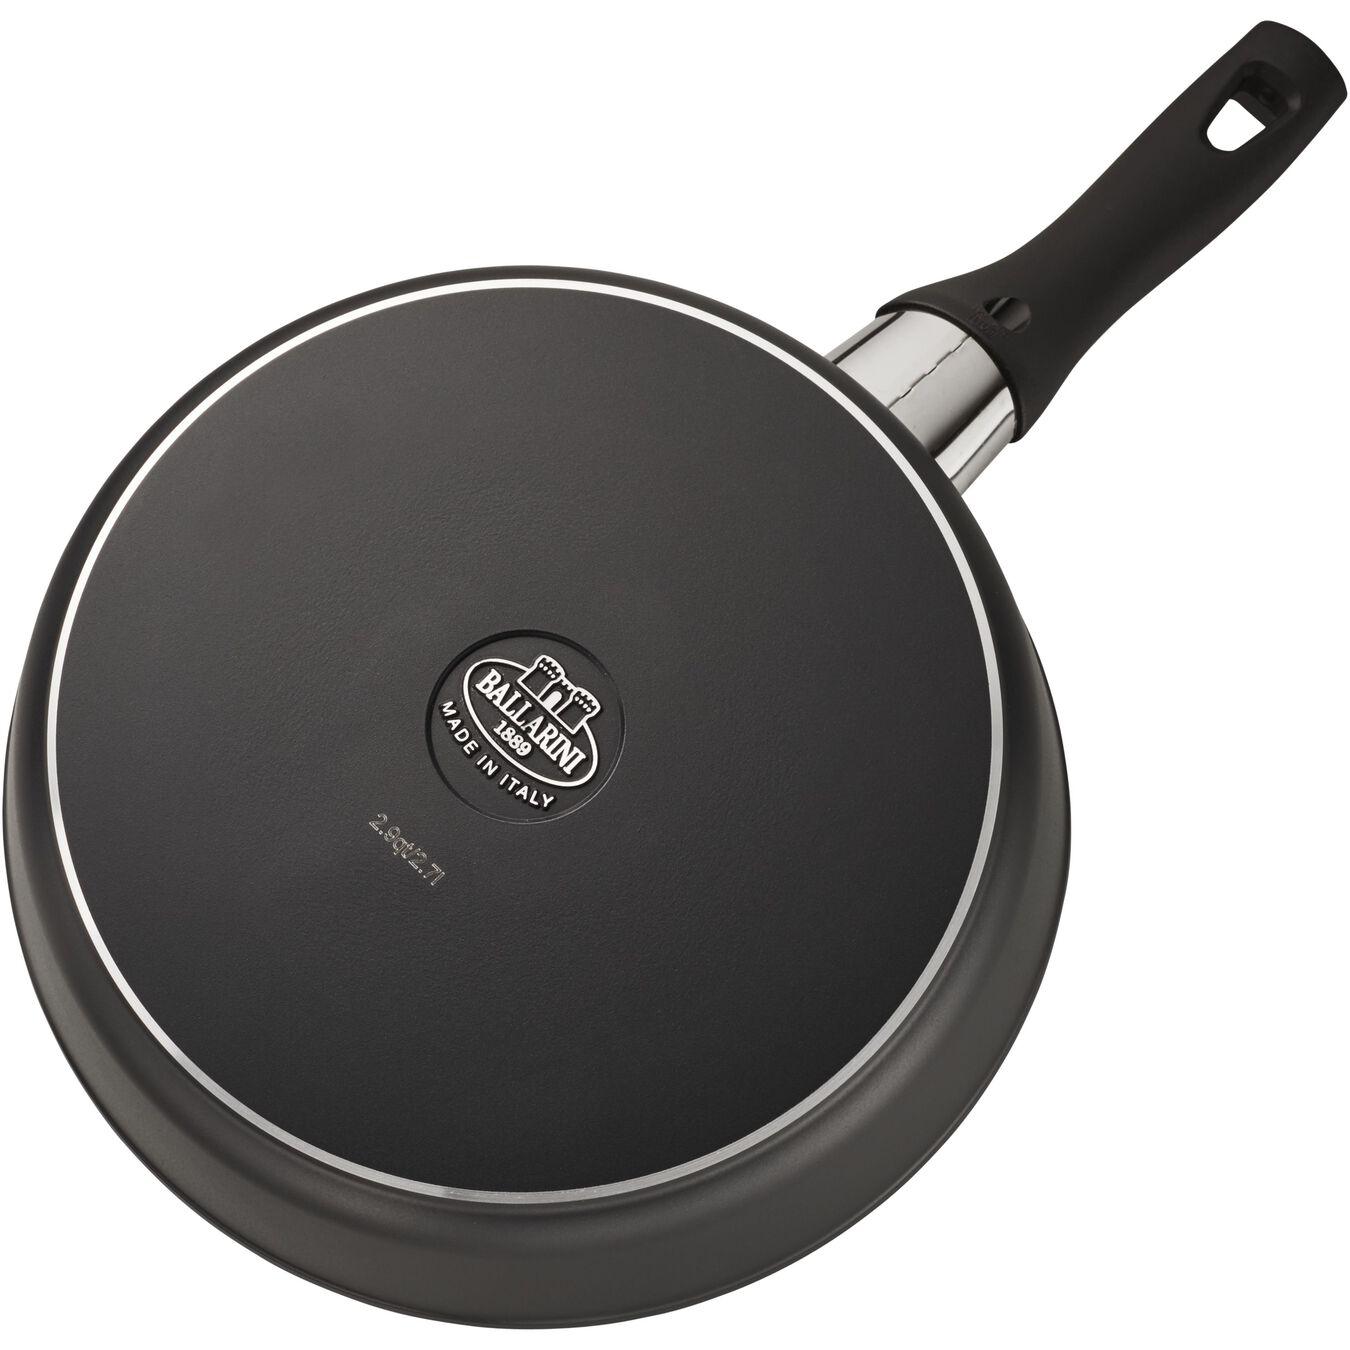 10-inch, Saute pan,,large 4